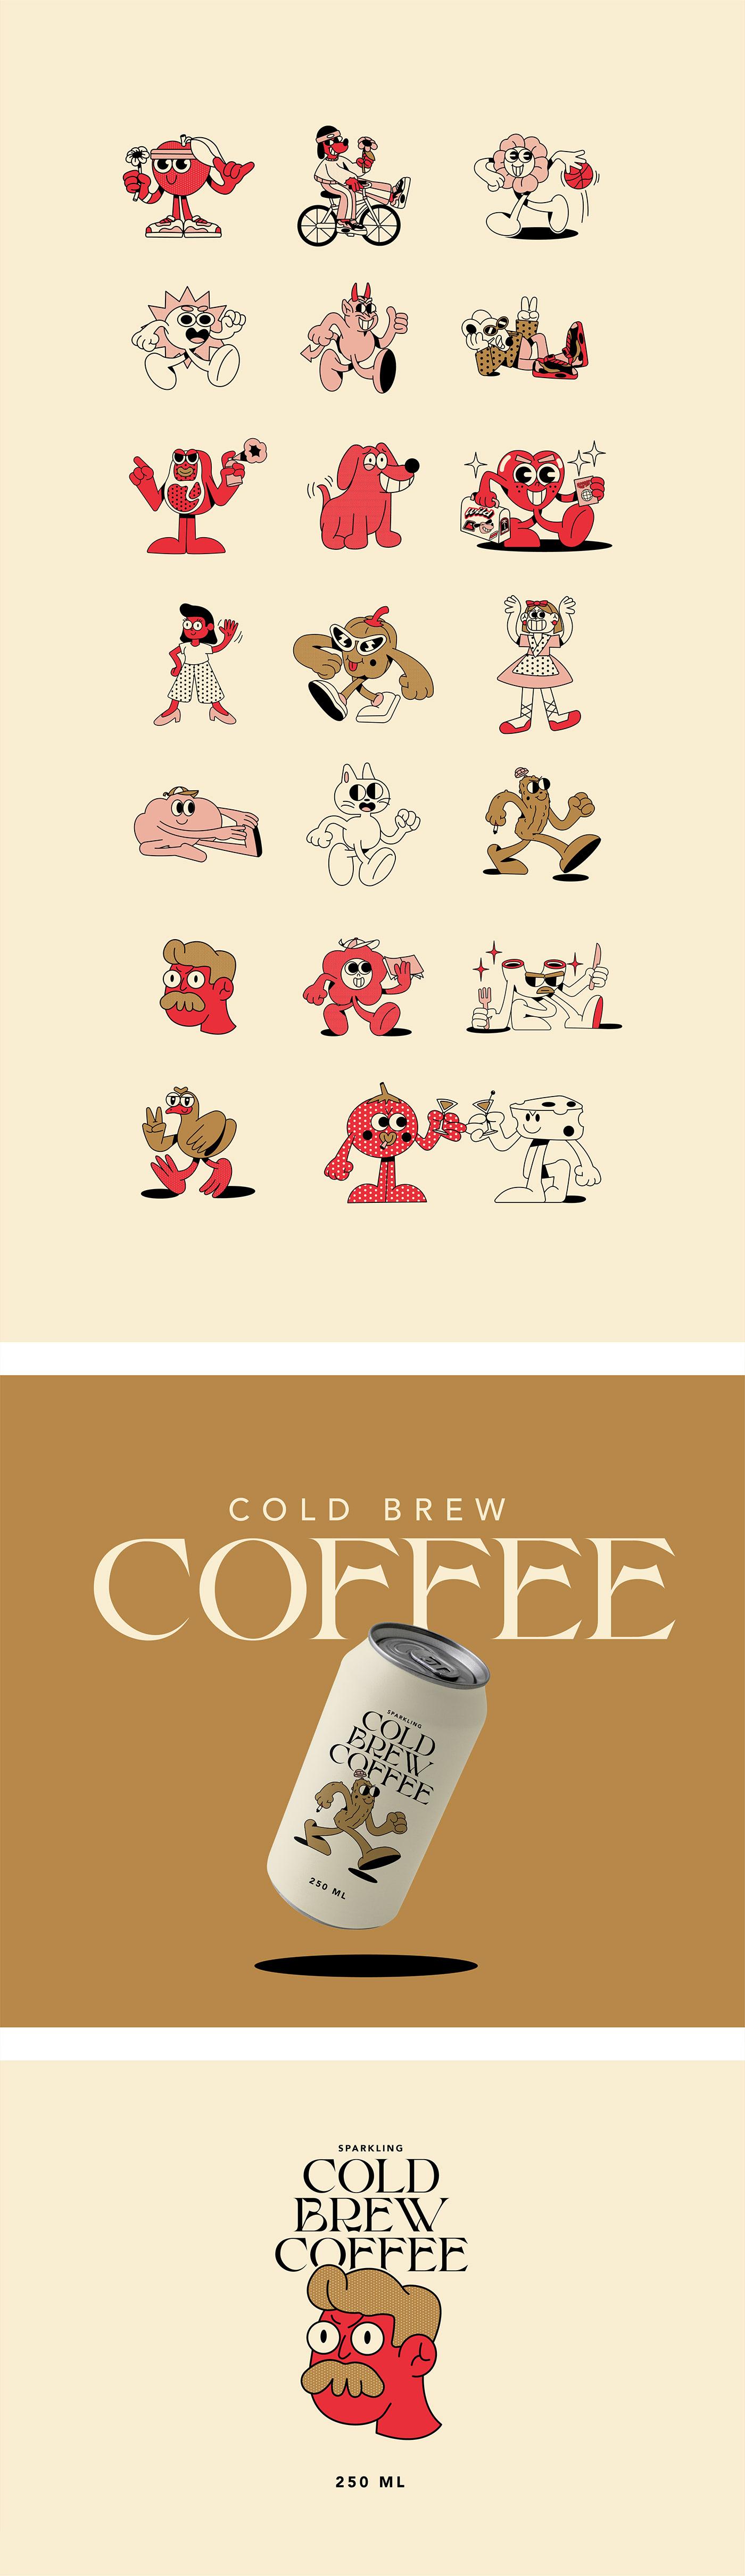 Character characterdesign design Digital Art  diseño graphicdesign ILLUSTRATION  Illustrator ilustracion vector